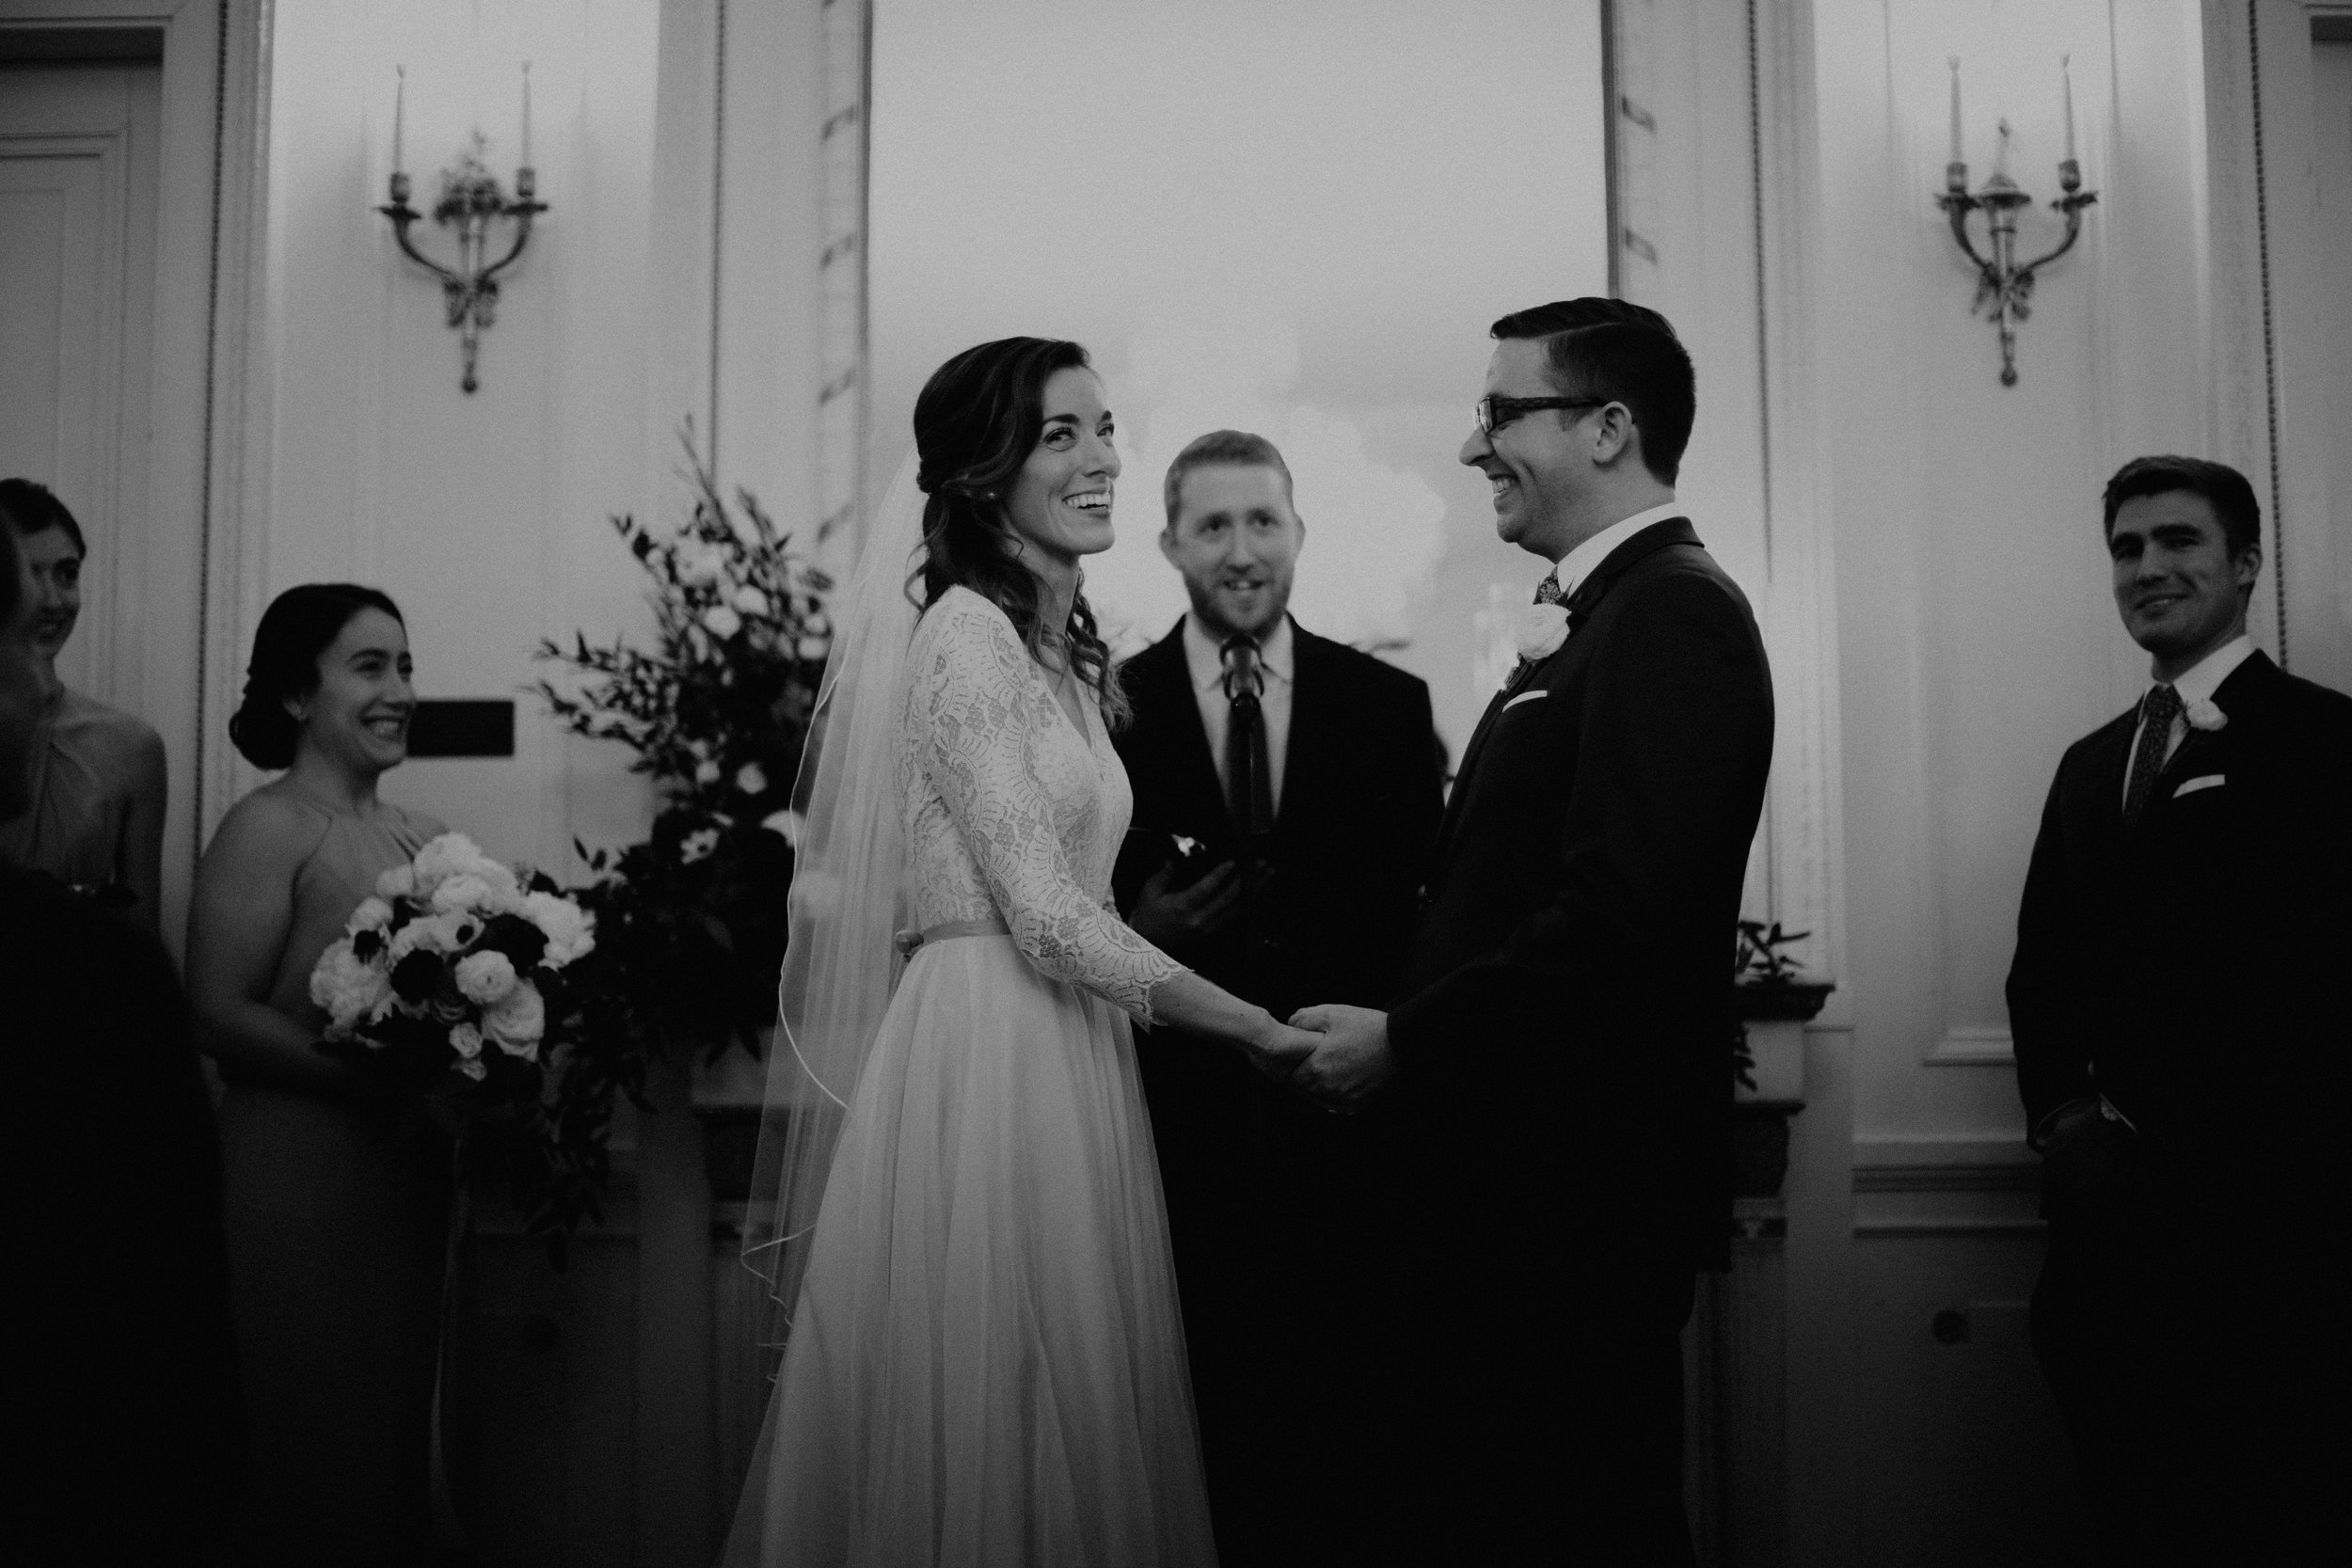 beverly_ma_wedding-67.jpg